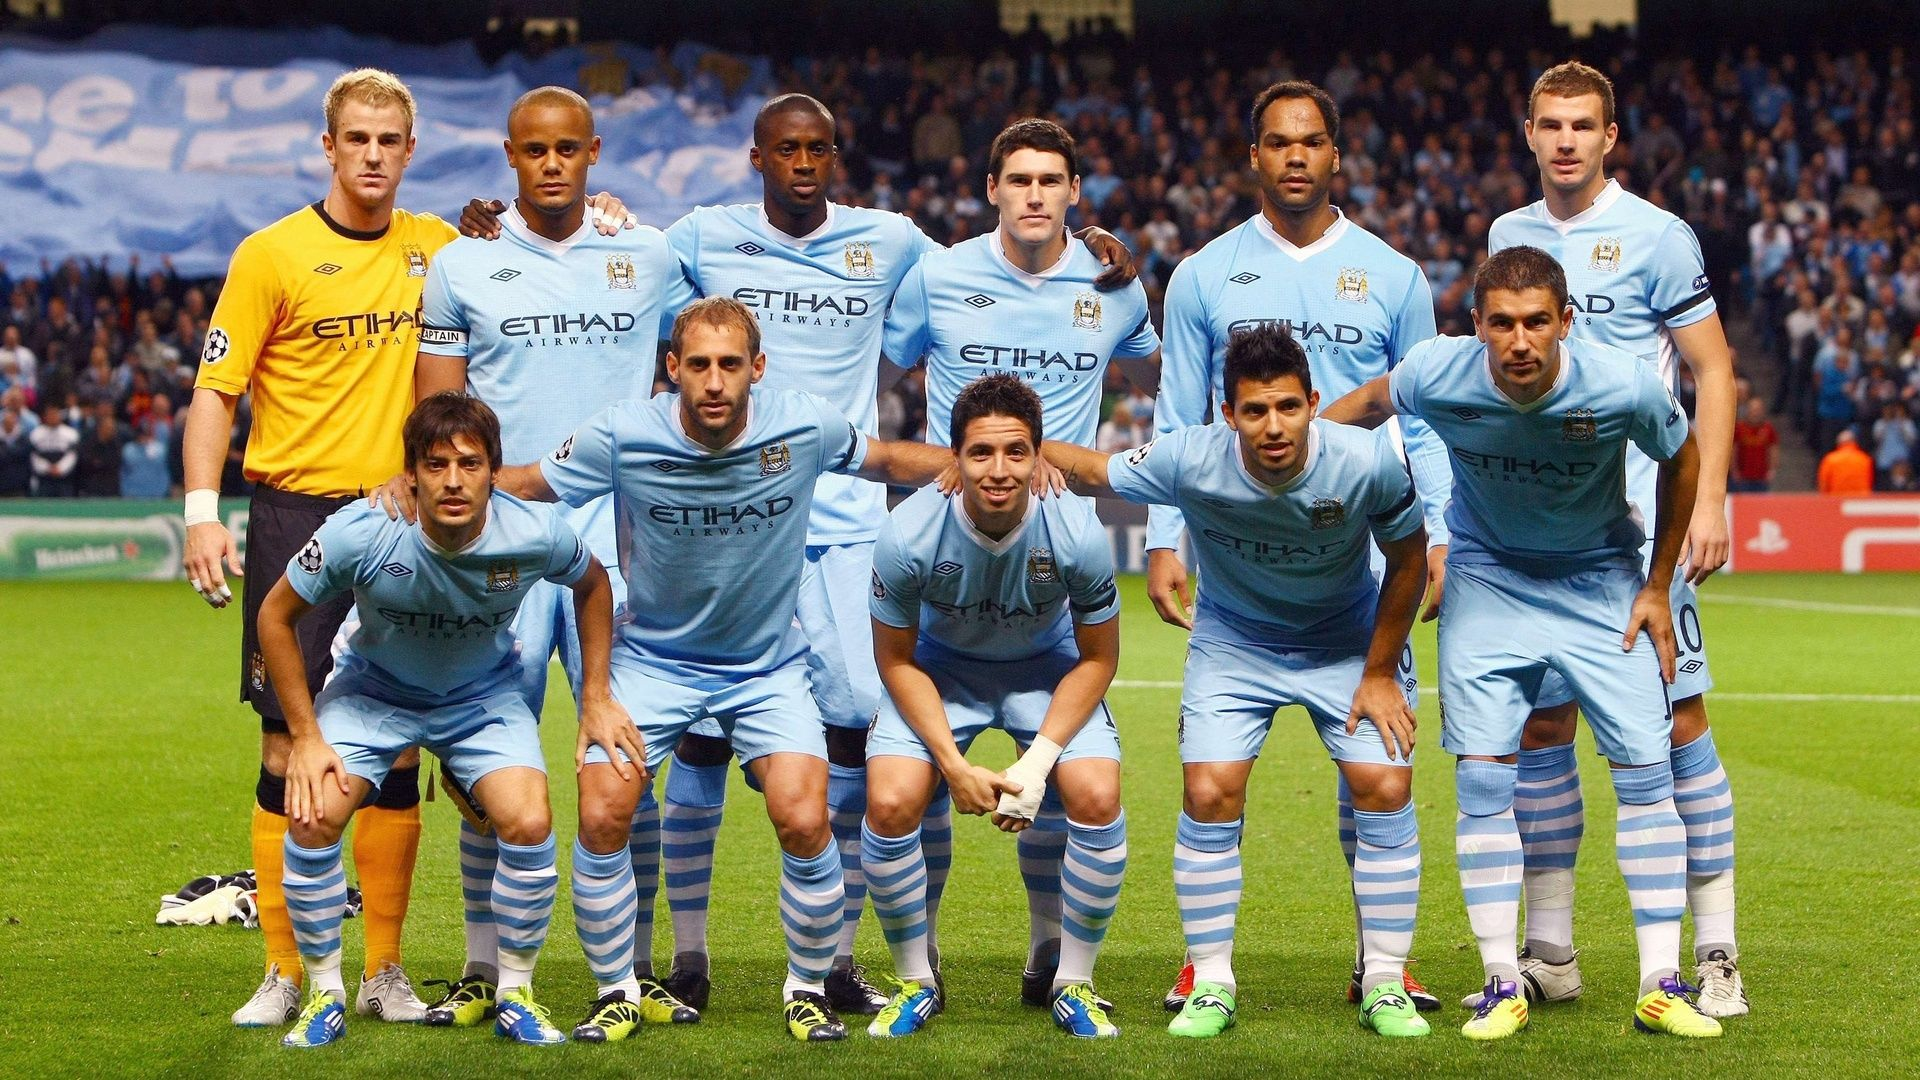 Manchester City Free Wallpaper